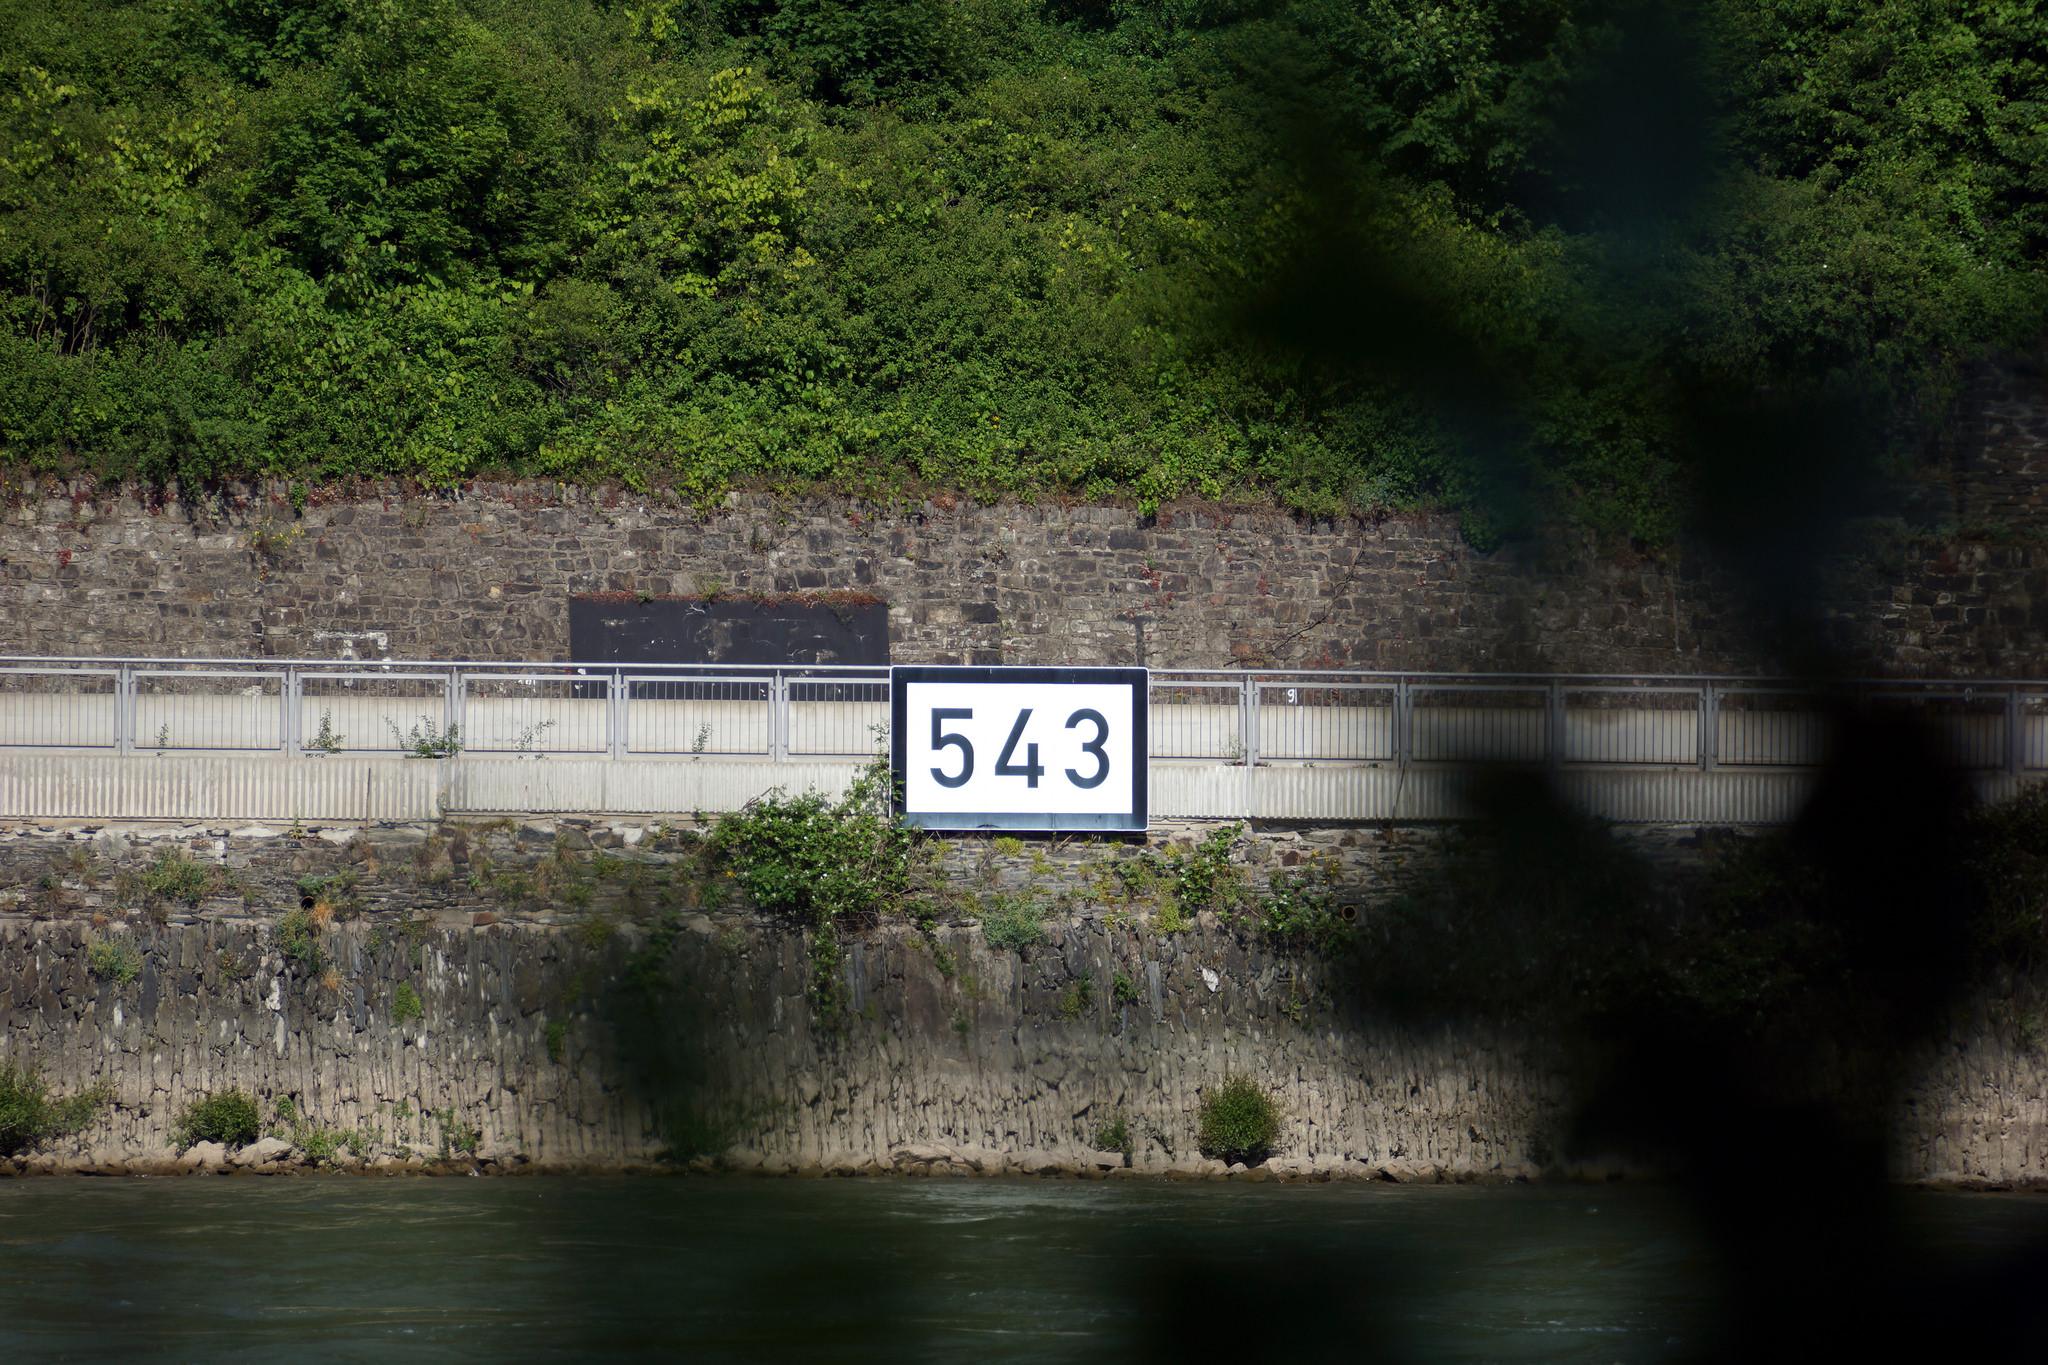 rheinkilometer-543